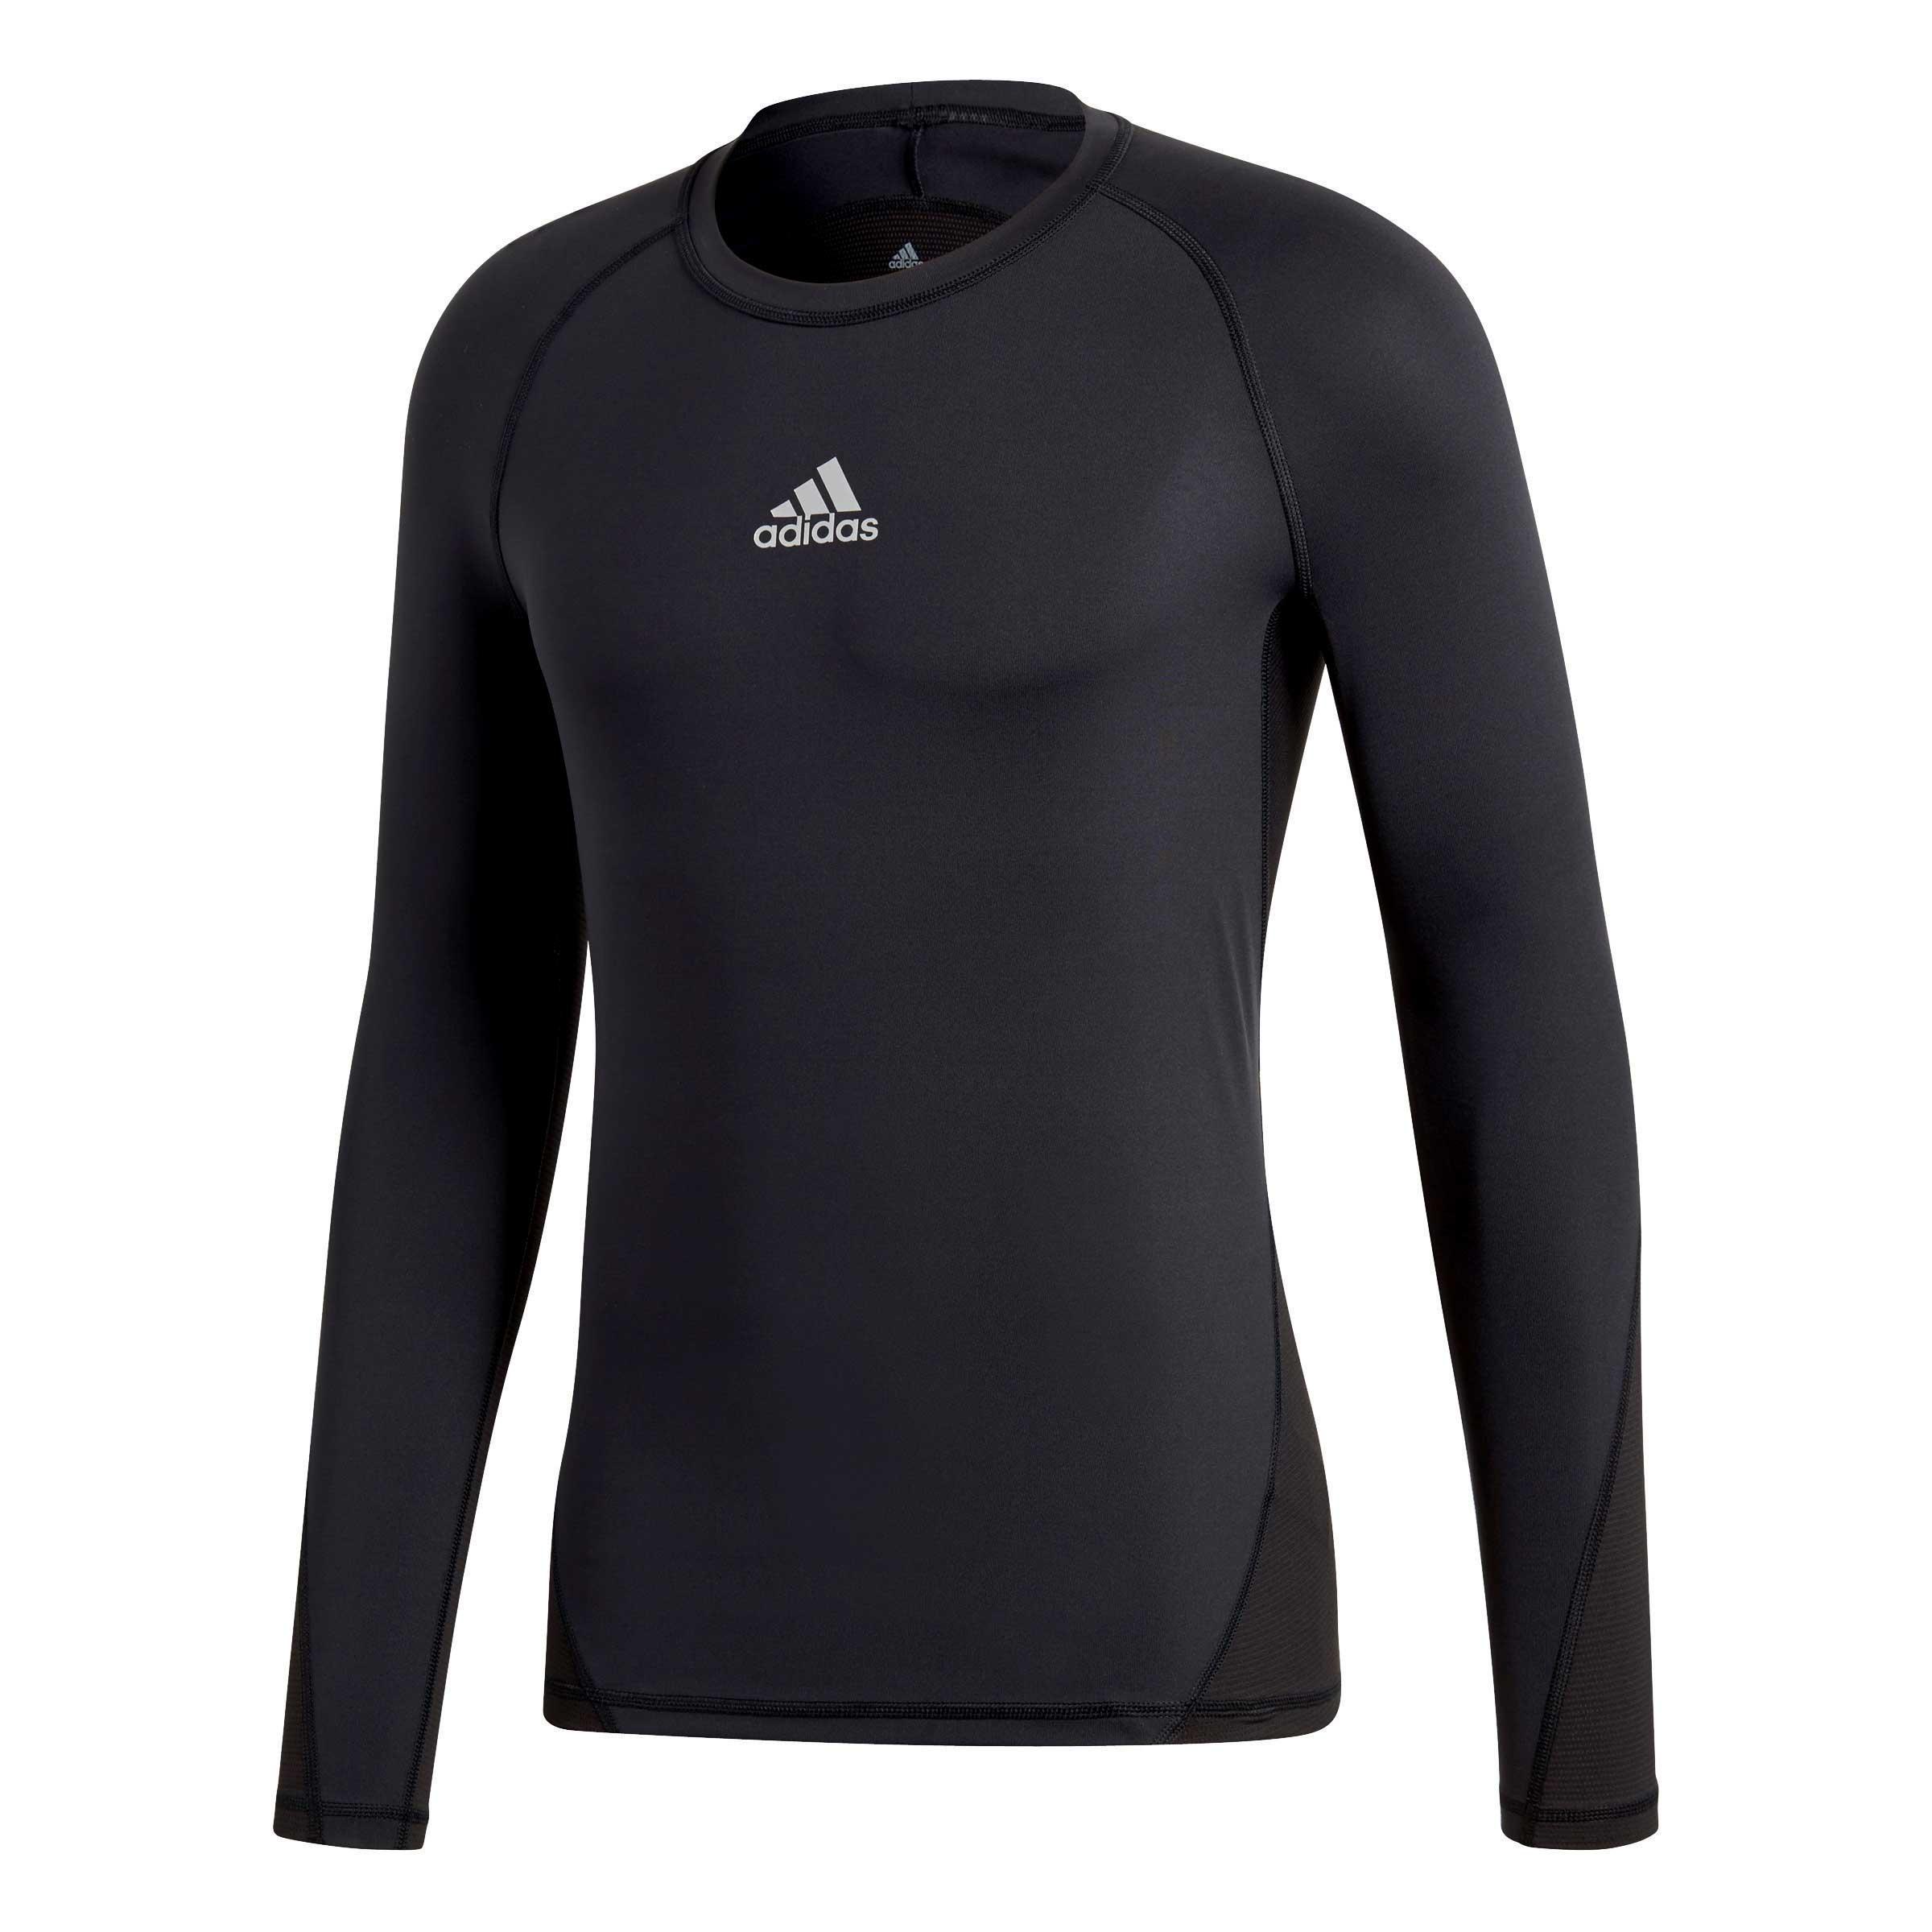 adidas Herren Langarm Shirt ALPHASKIN TECHFIT CW9486 M